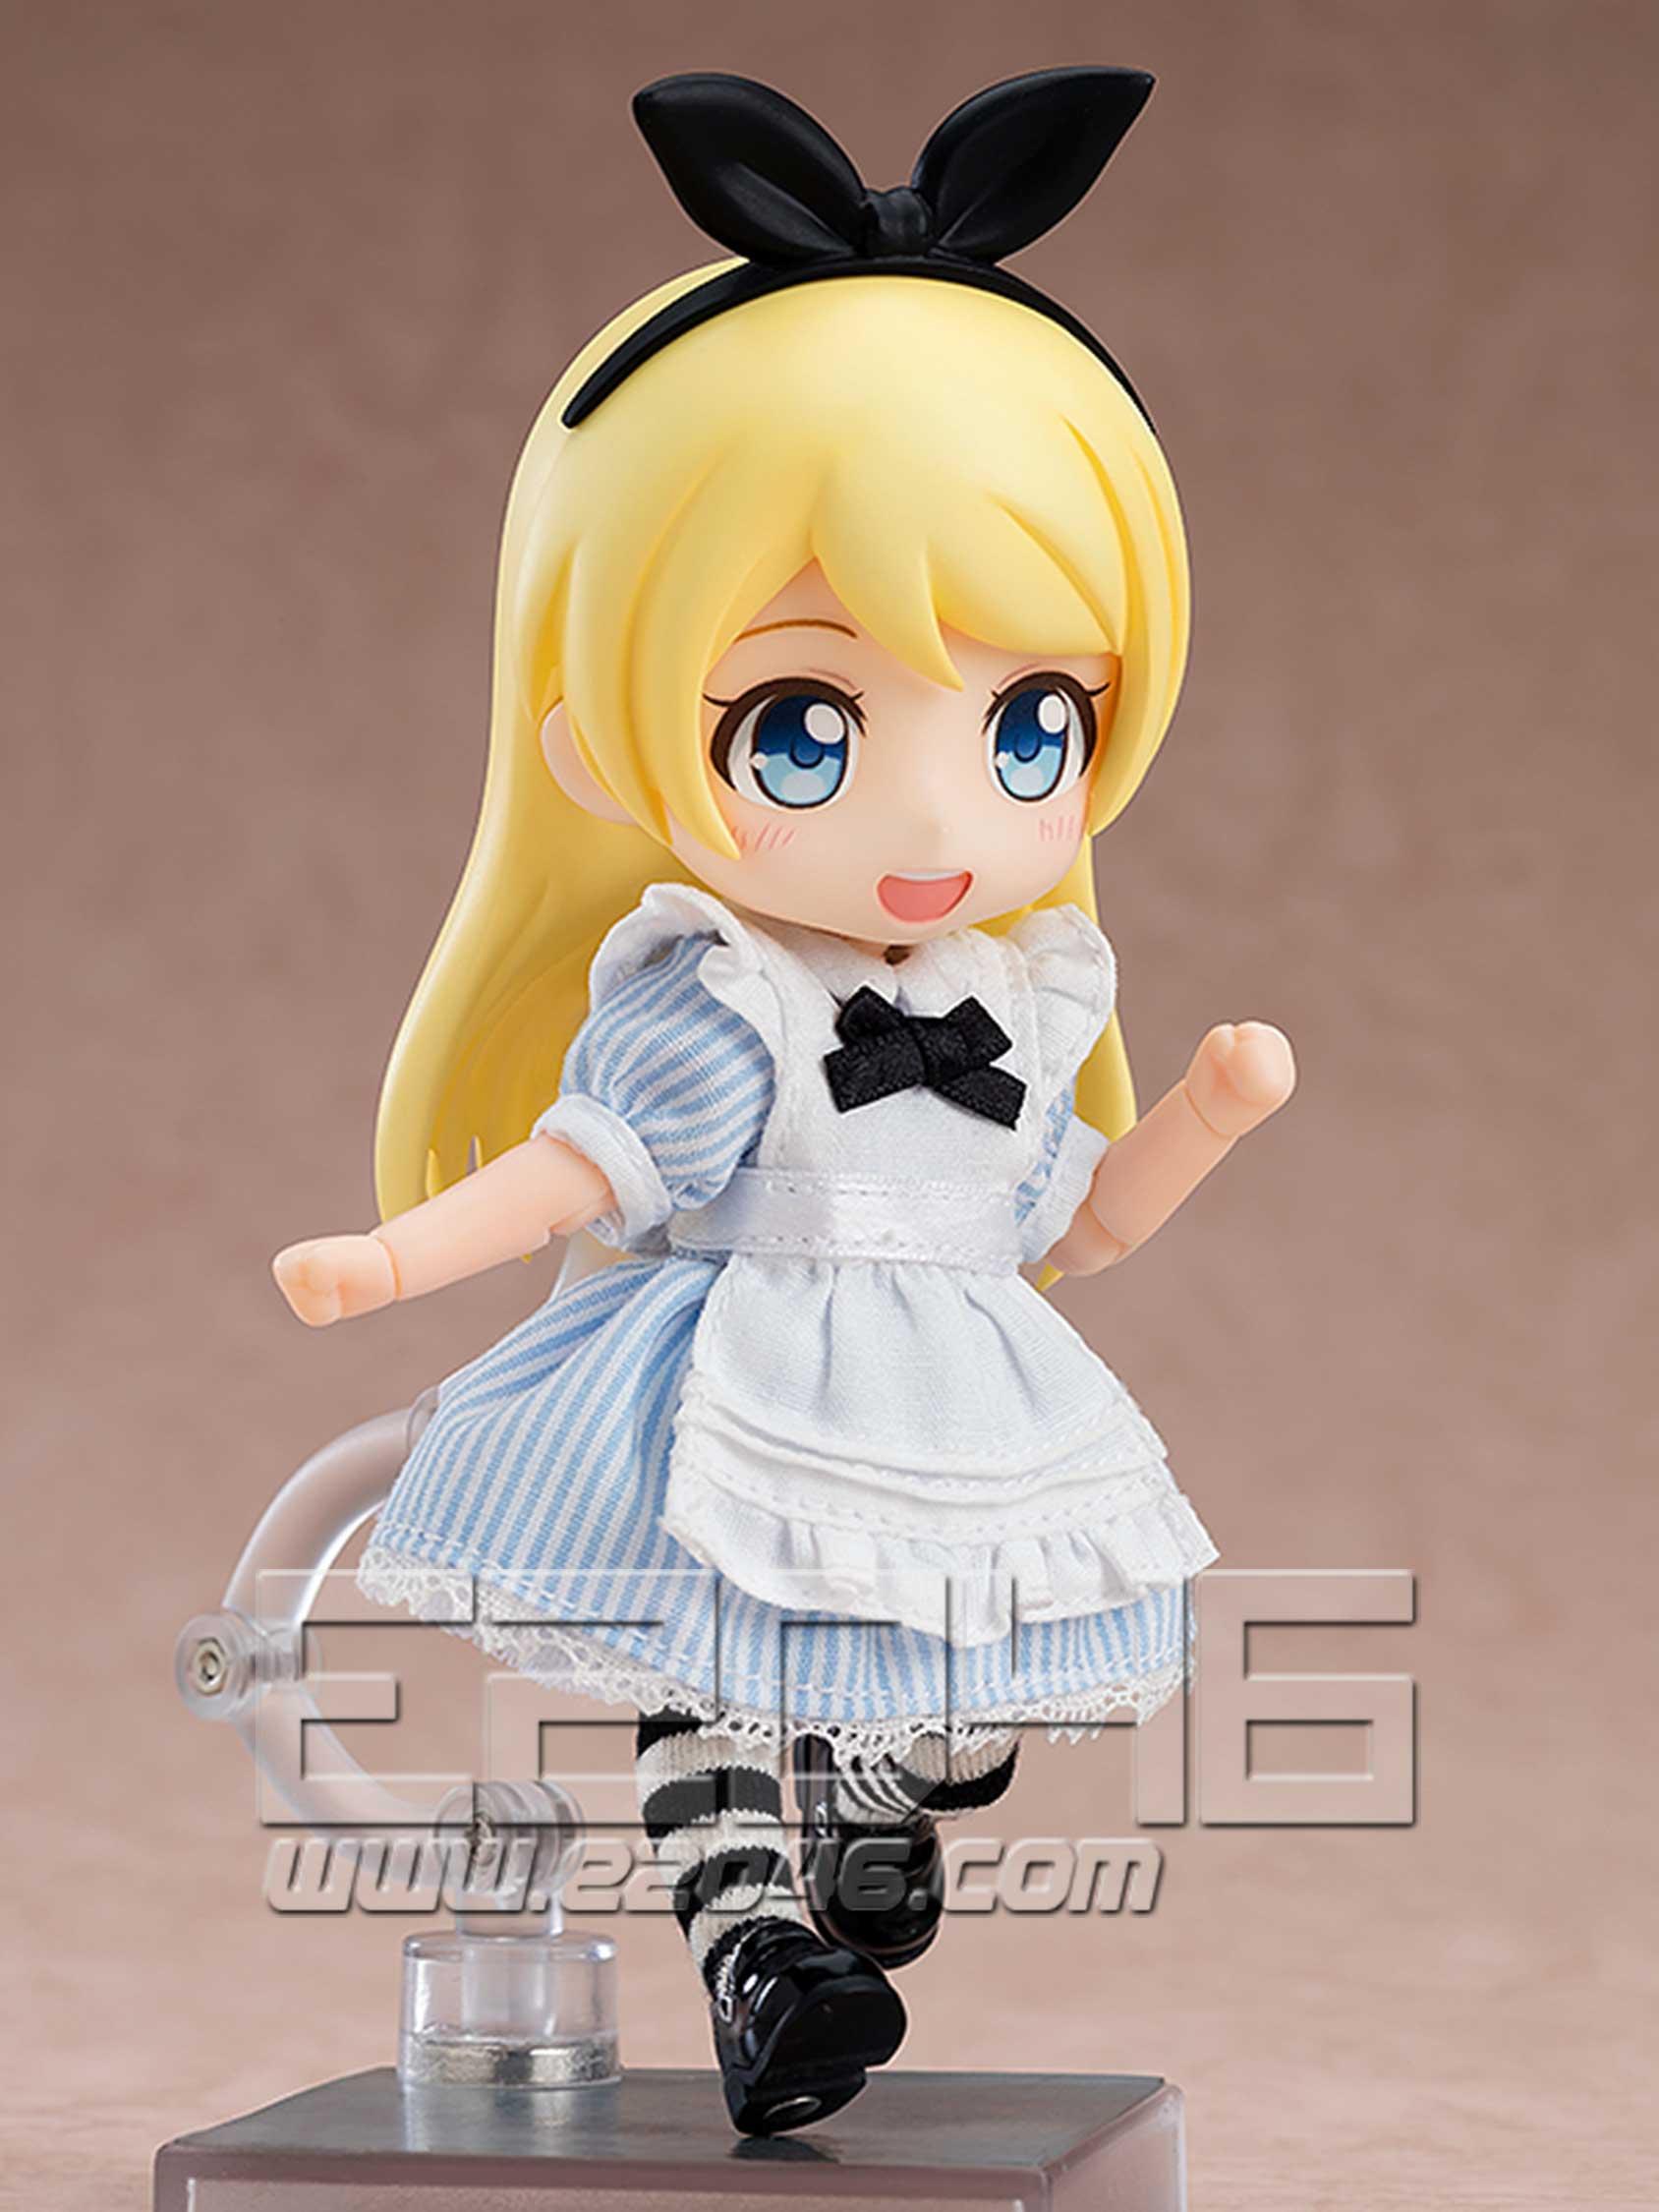 Nendoroid 爱丽丝 (PVC)